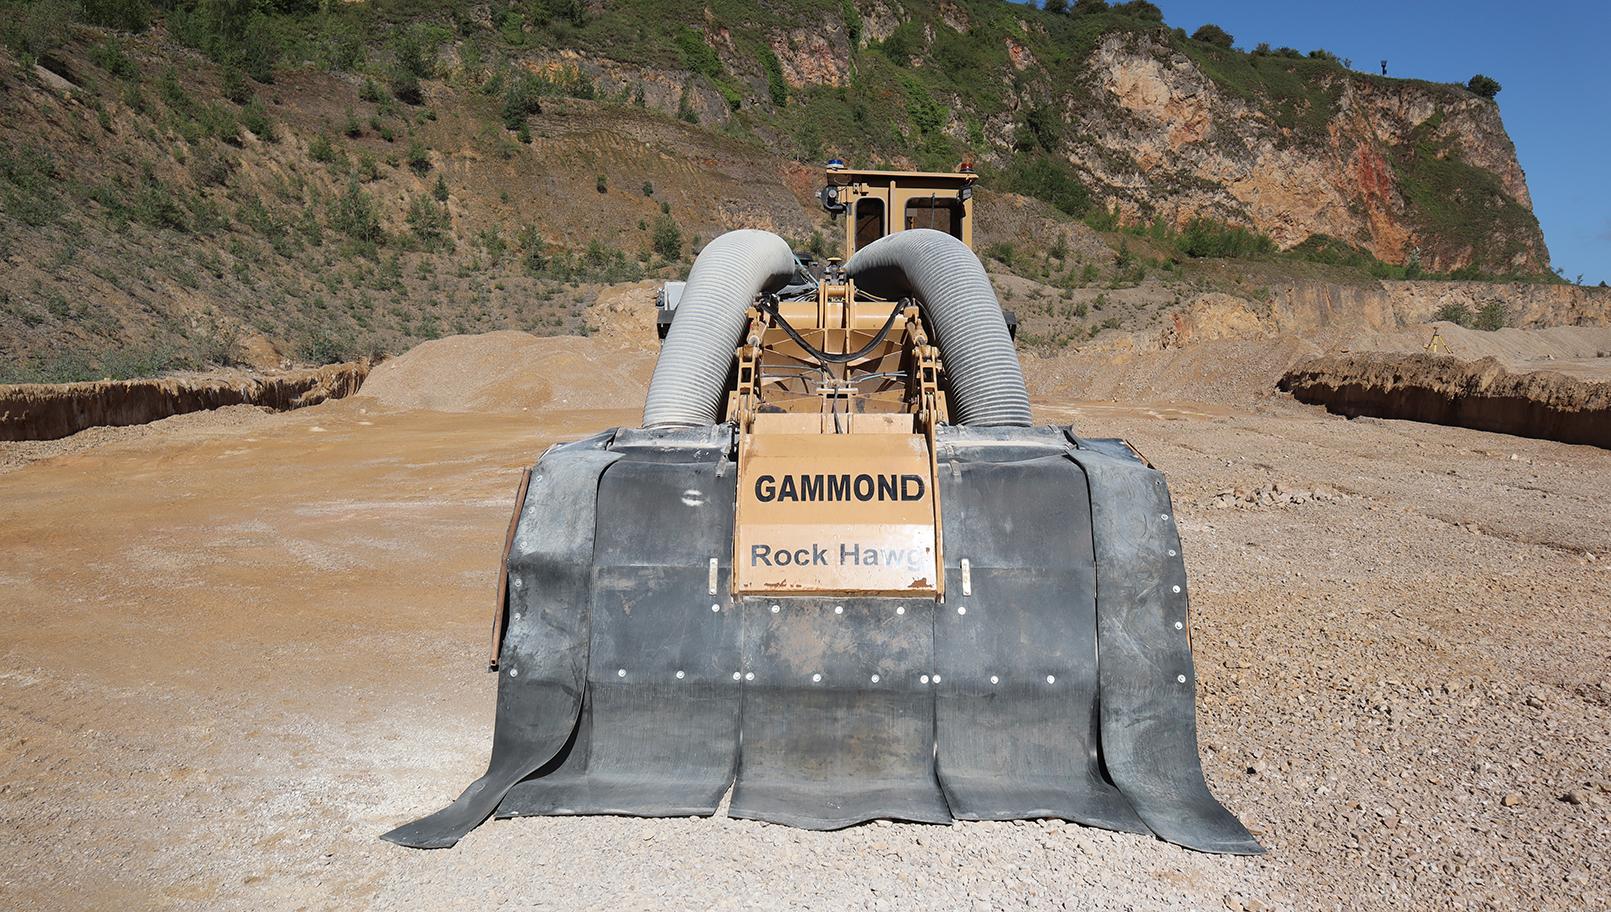 AJ Gammond Tesmec Rock Hawg Surface Miner